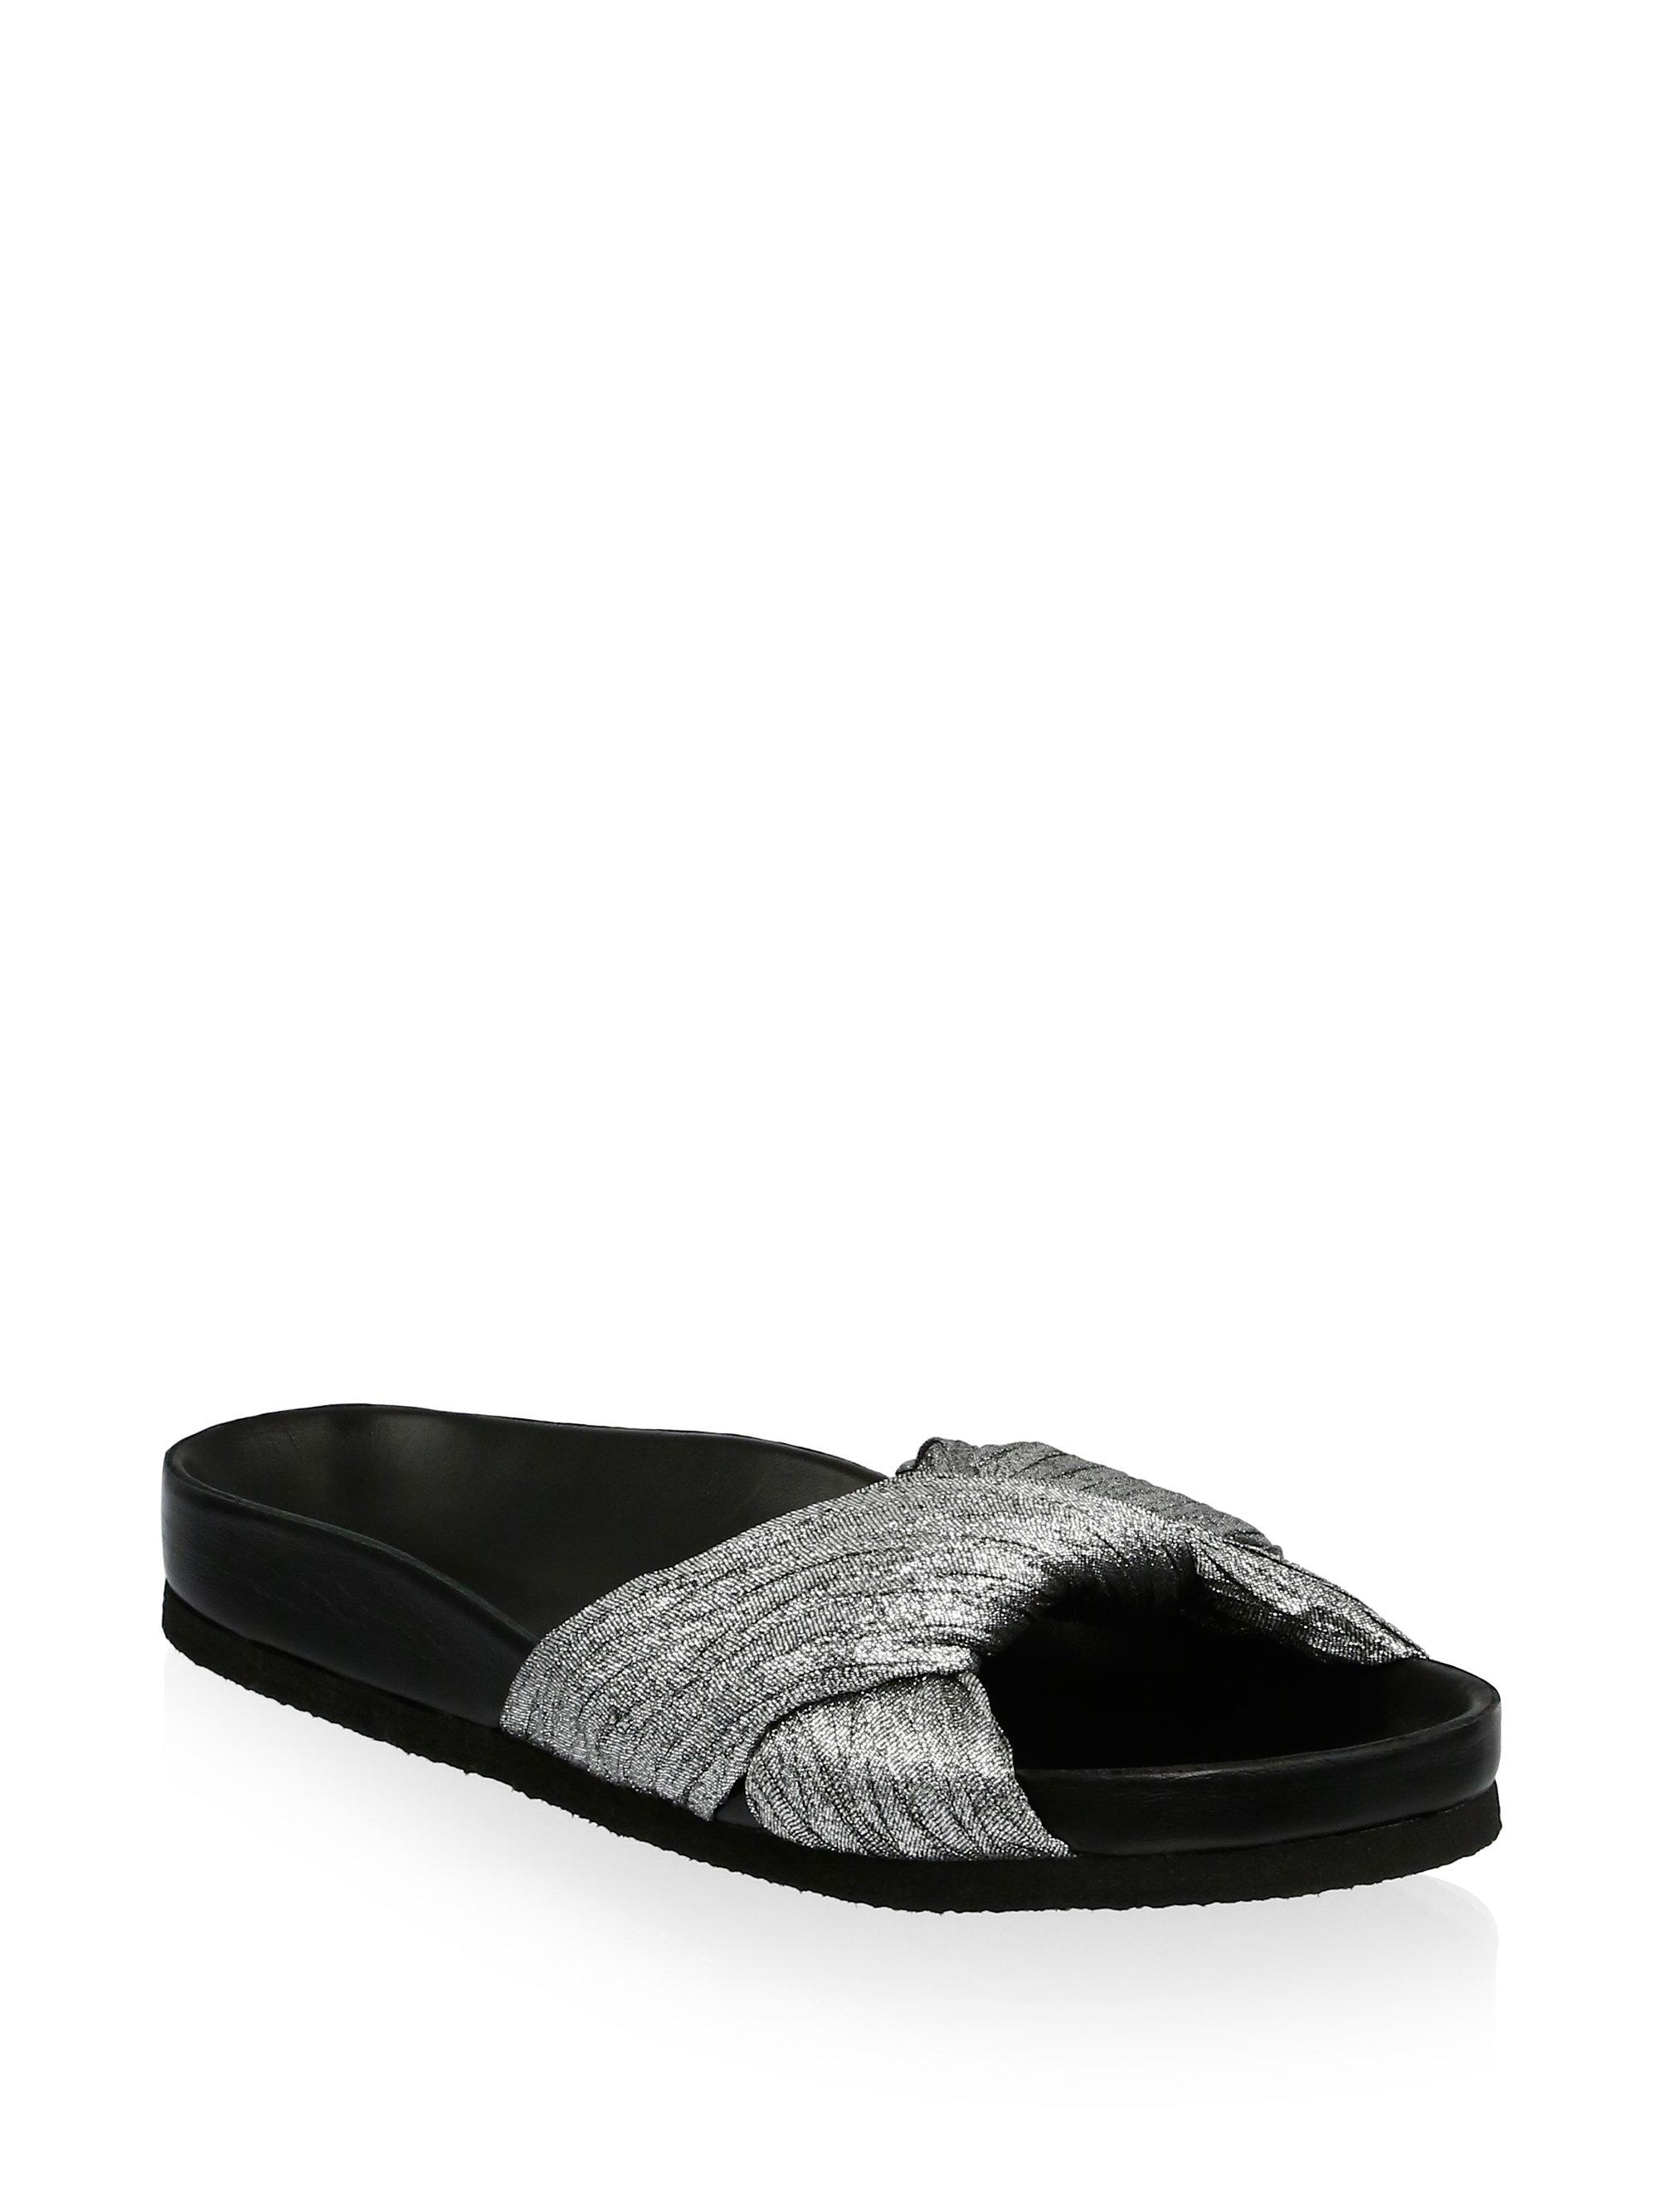 IRO Kaely Slide Sandals C5msHF5